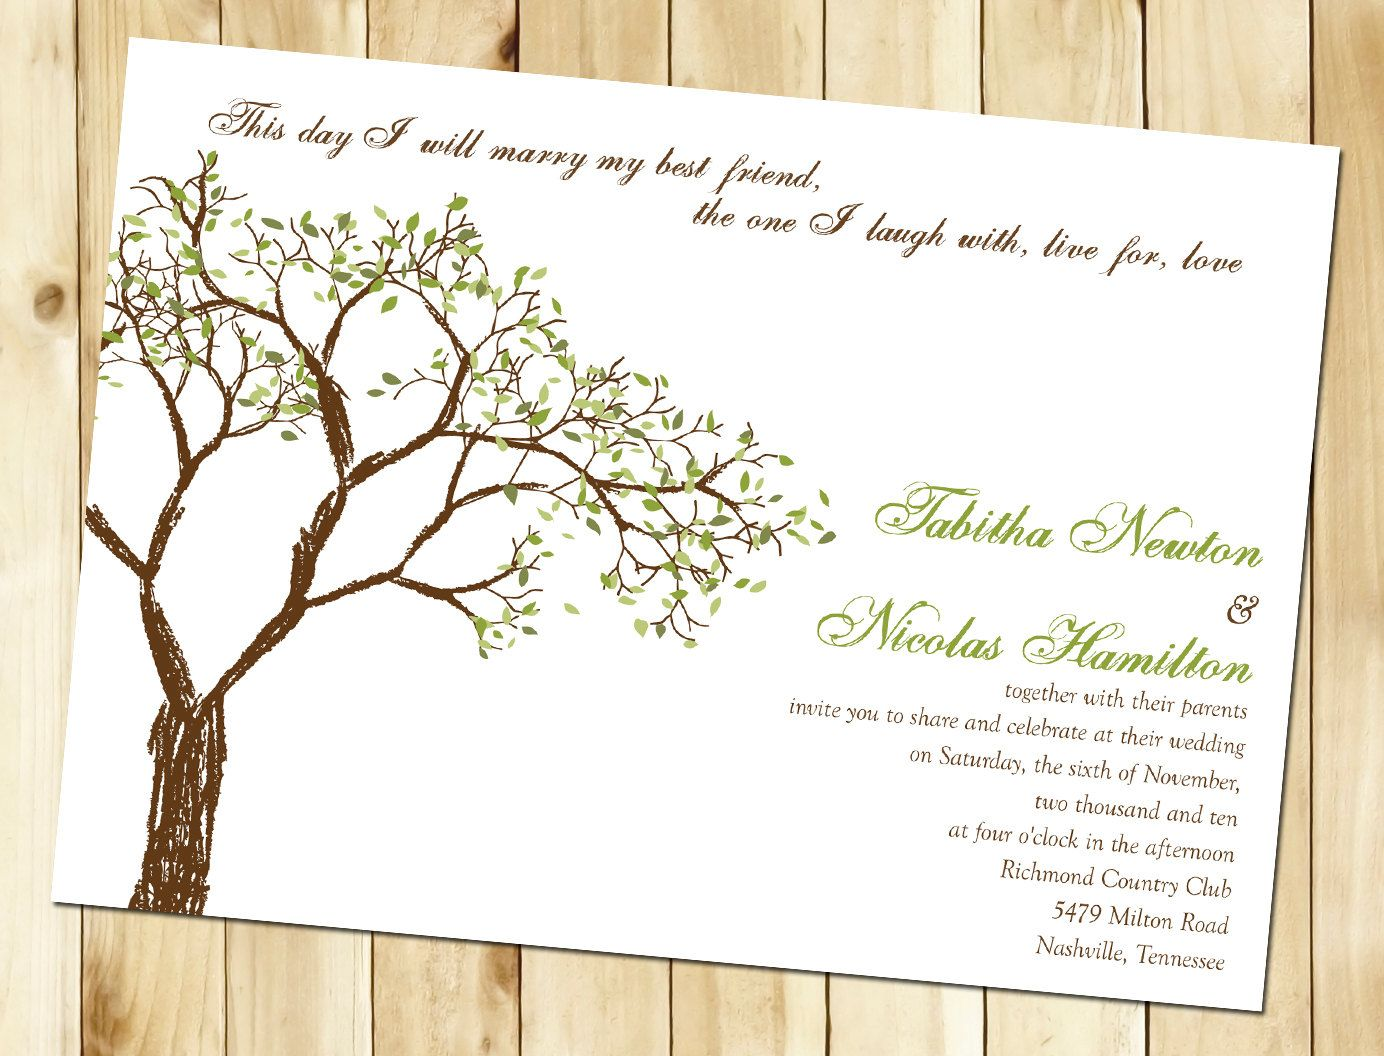 sample wedding invitations Fall Tree Wedding Invitation Sample by nmiphotocreations on Etsy 3 00 a little sneak peak